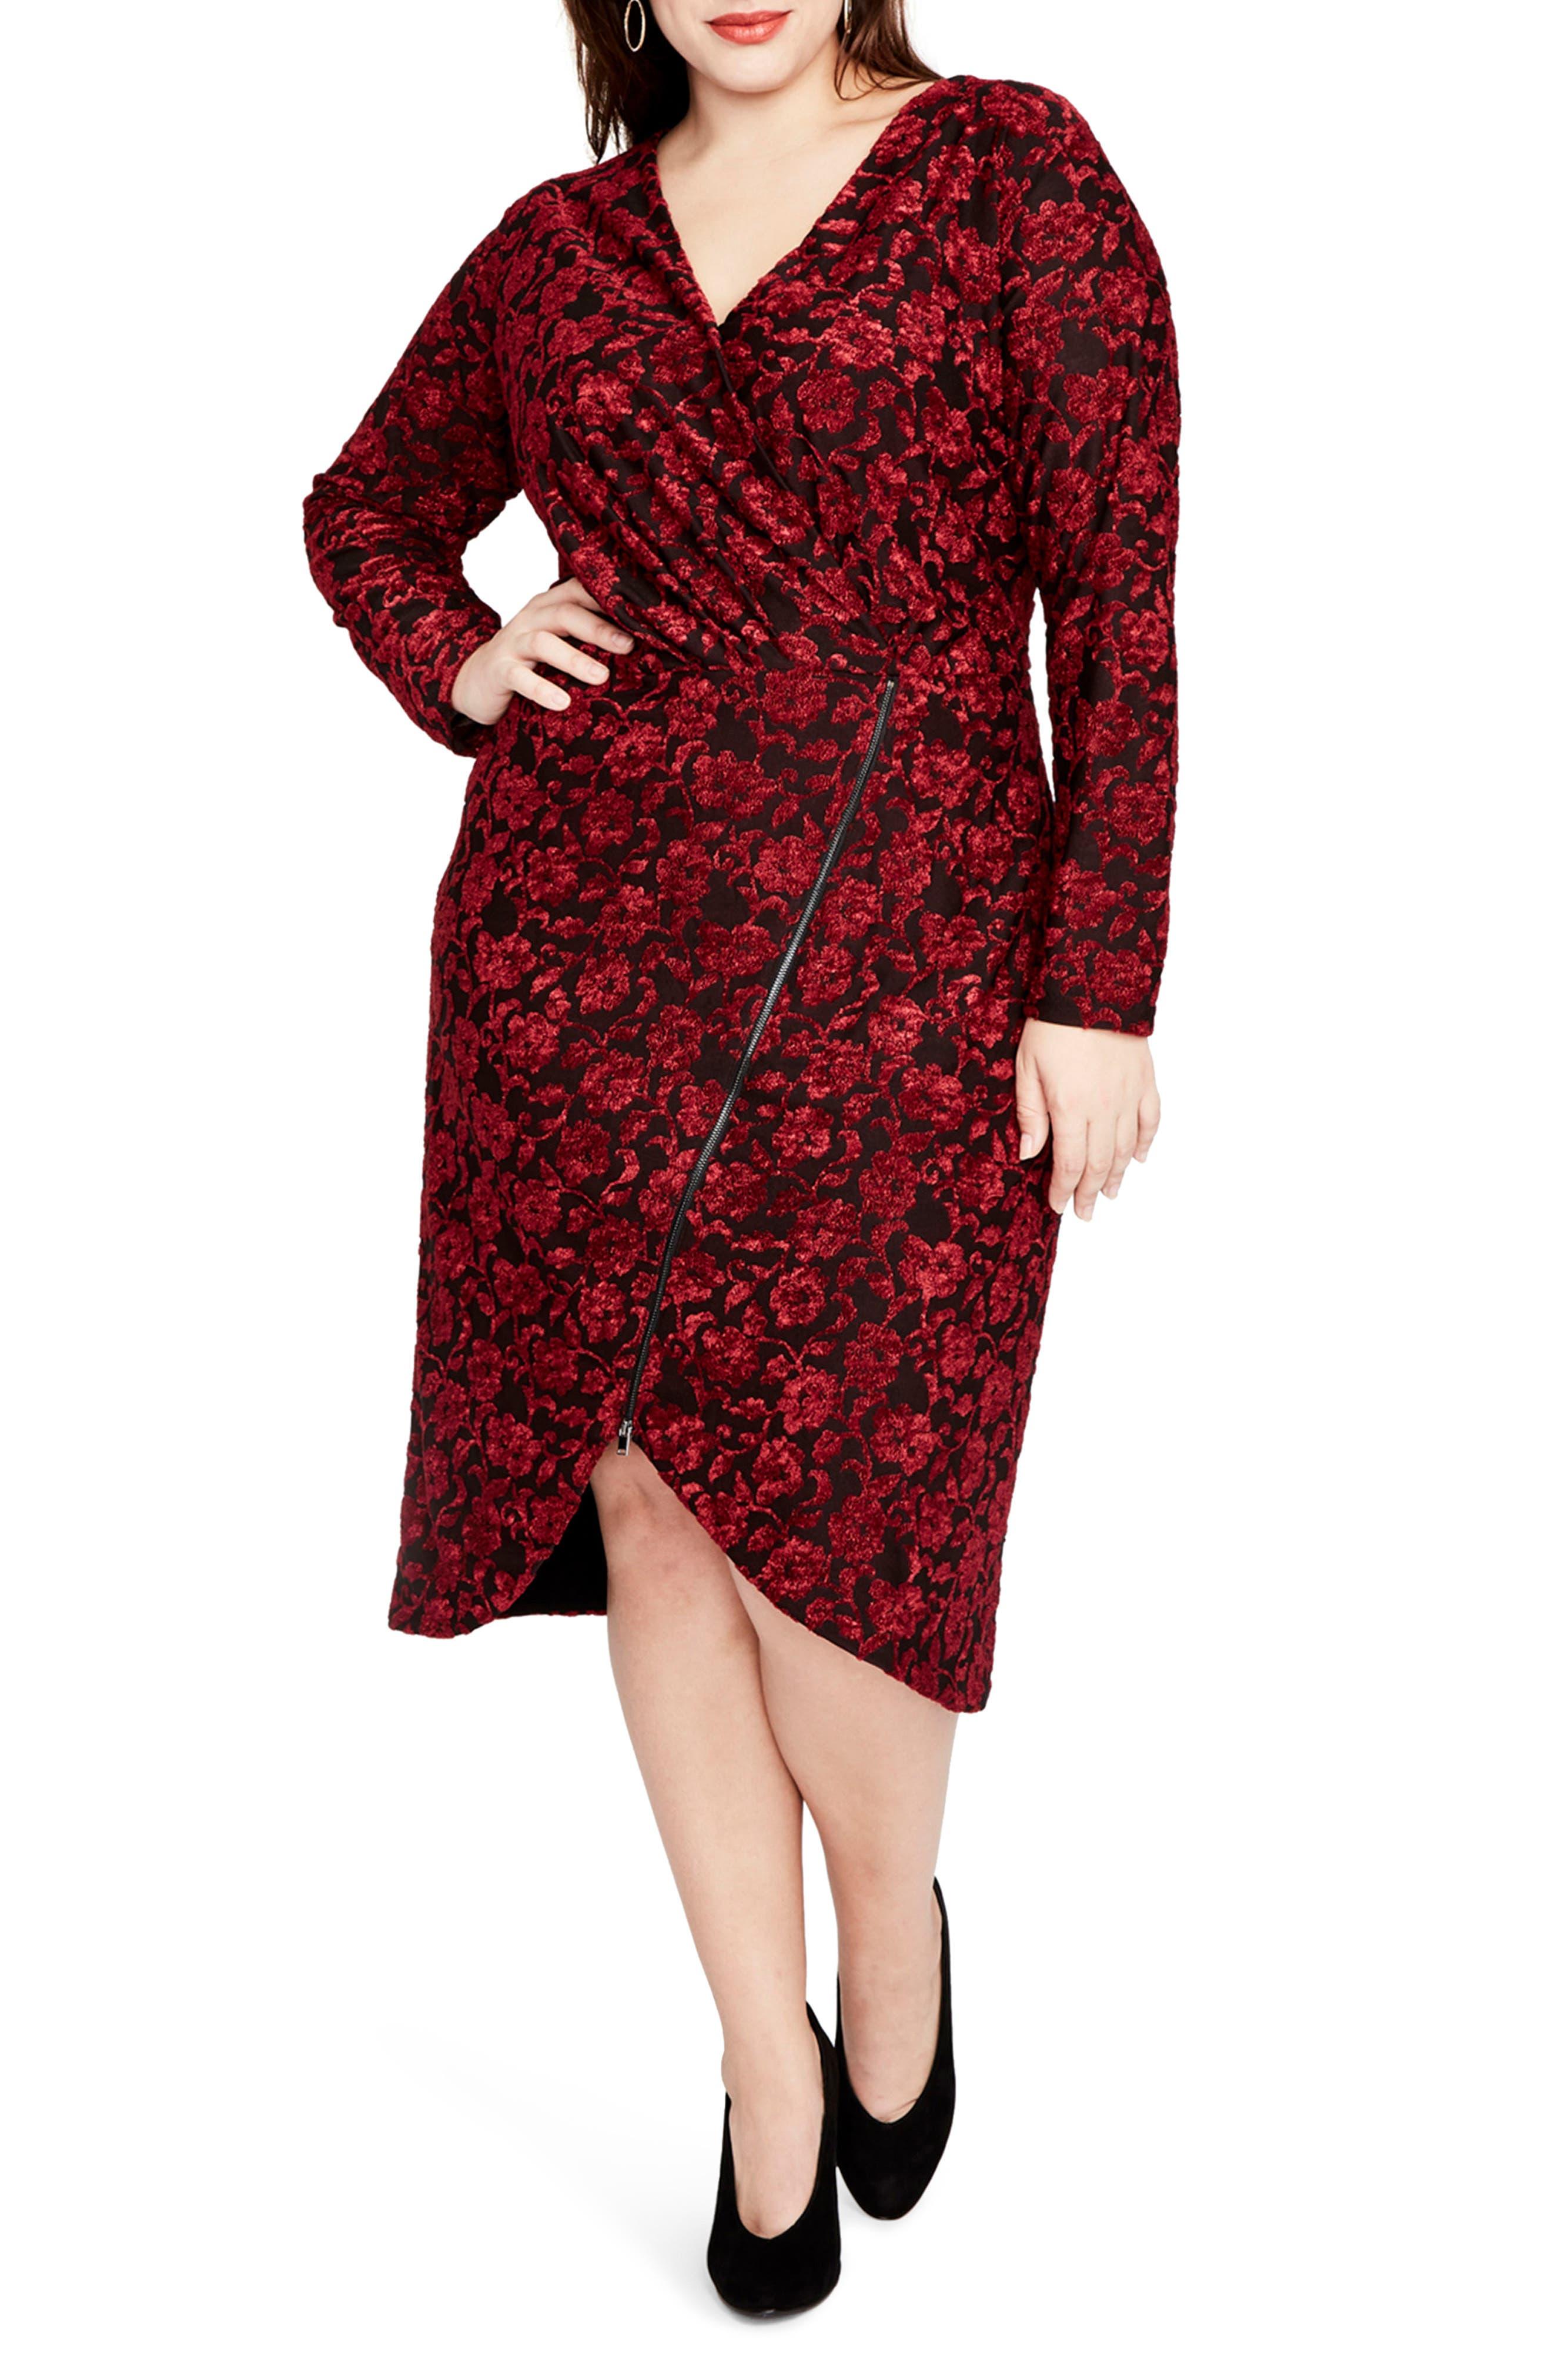 Alternate Image 1 Selected - RACHEL Rachel Roy Velvet Floral Zip Front Dress (Plus Size)